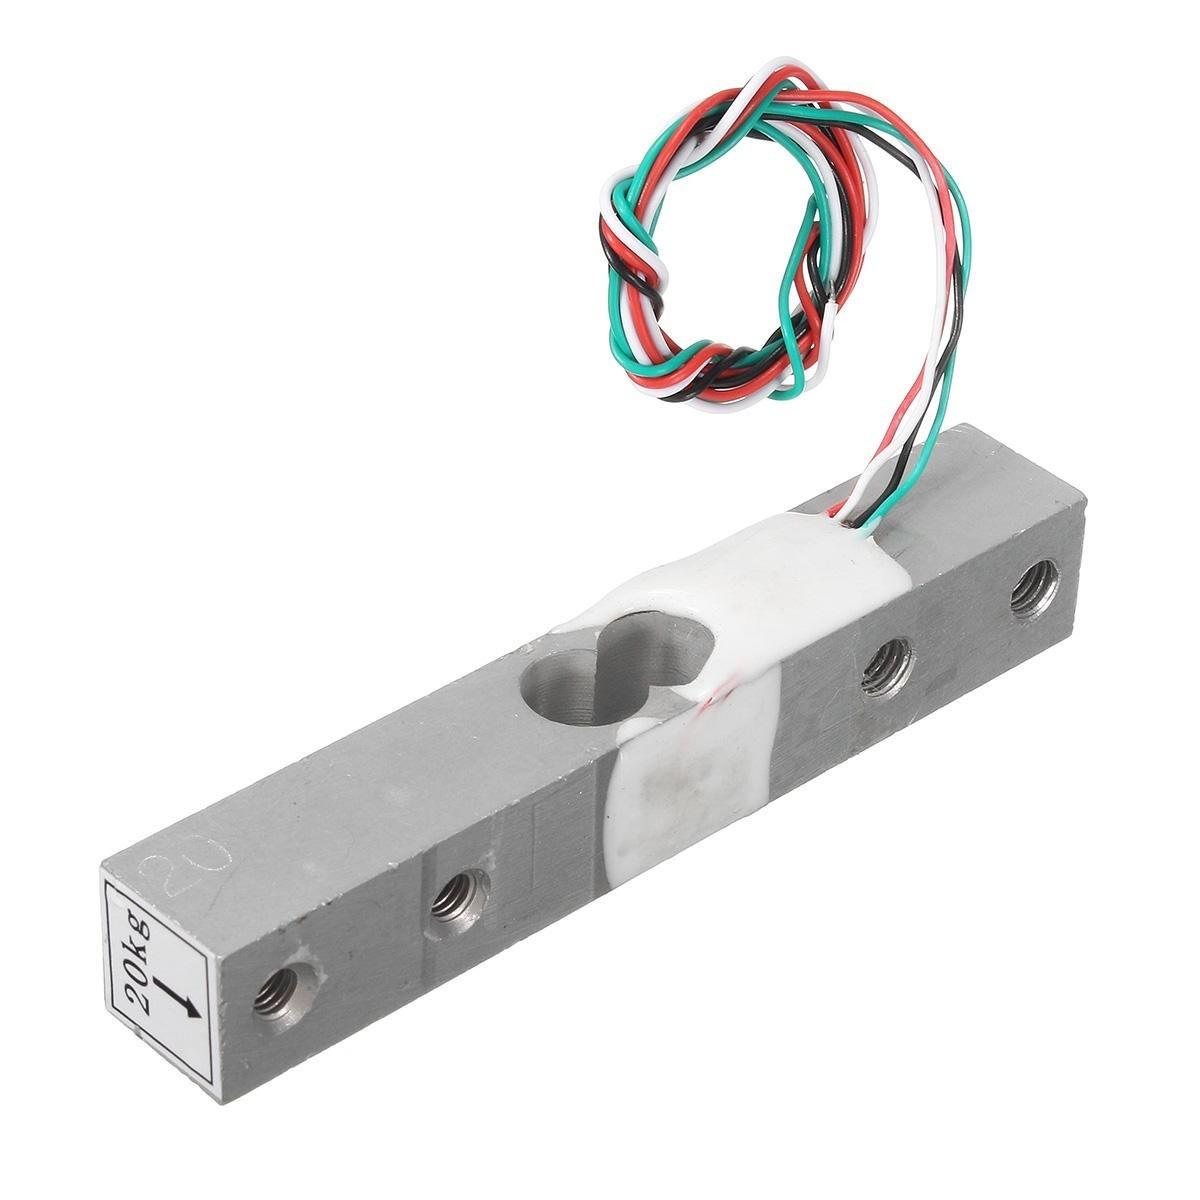 HX711 Module + 20kg Aluminum Alloy Scale Weighing Sensor